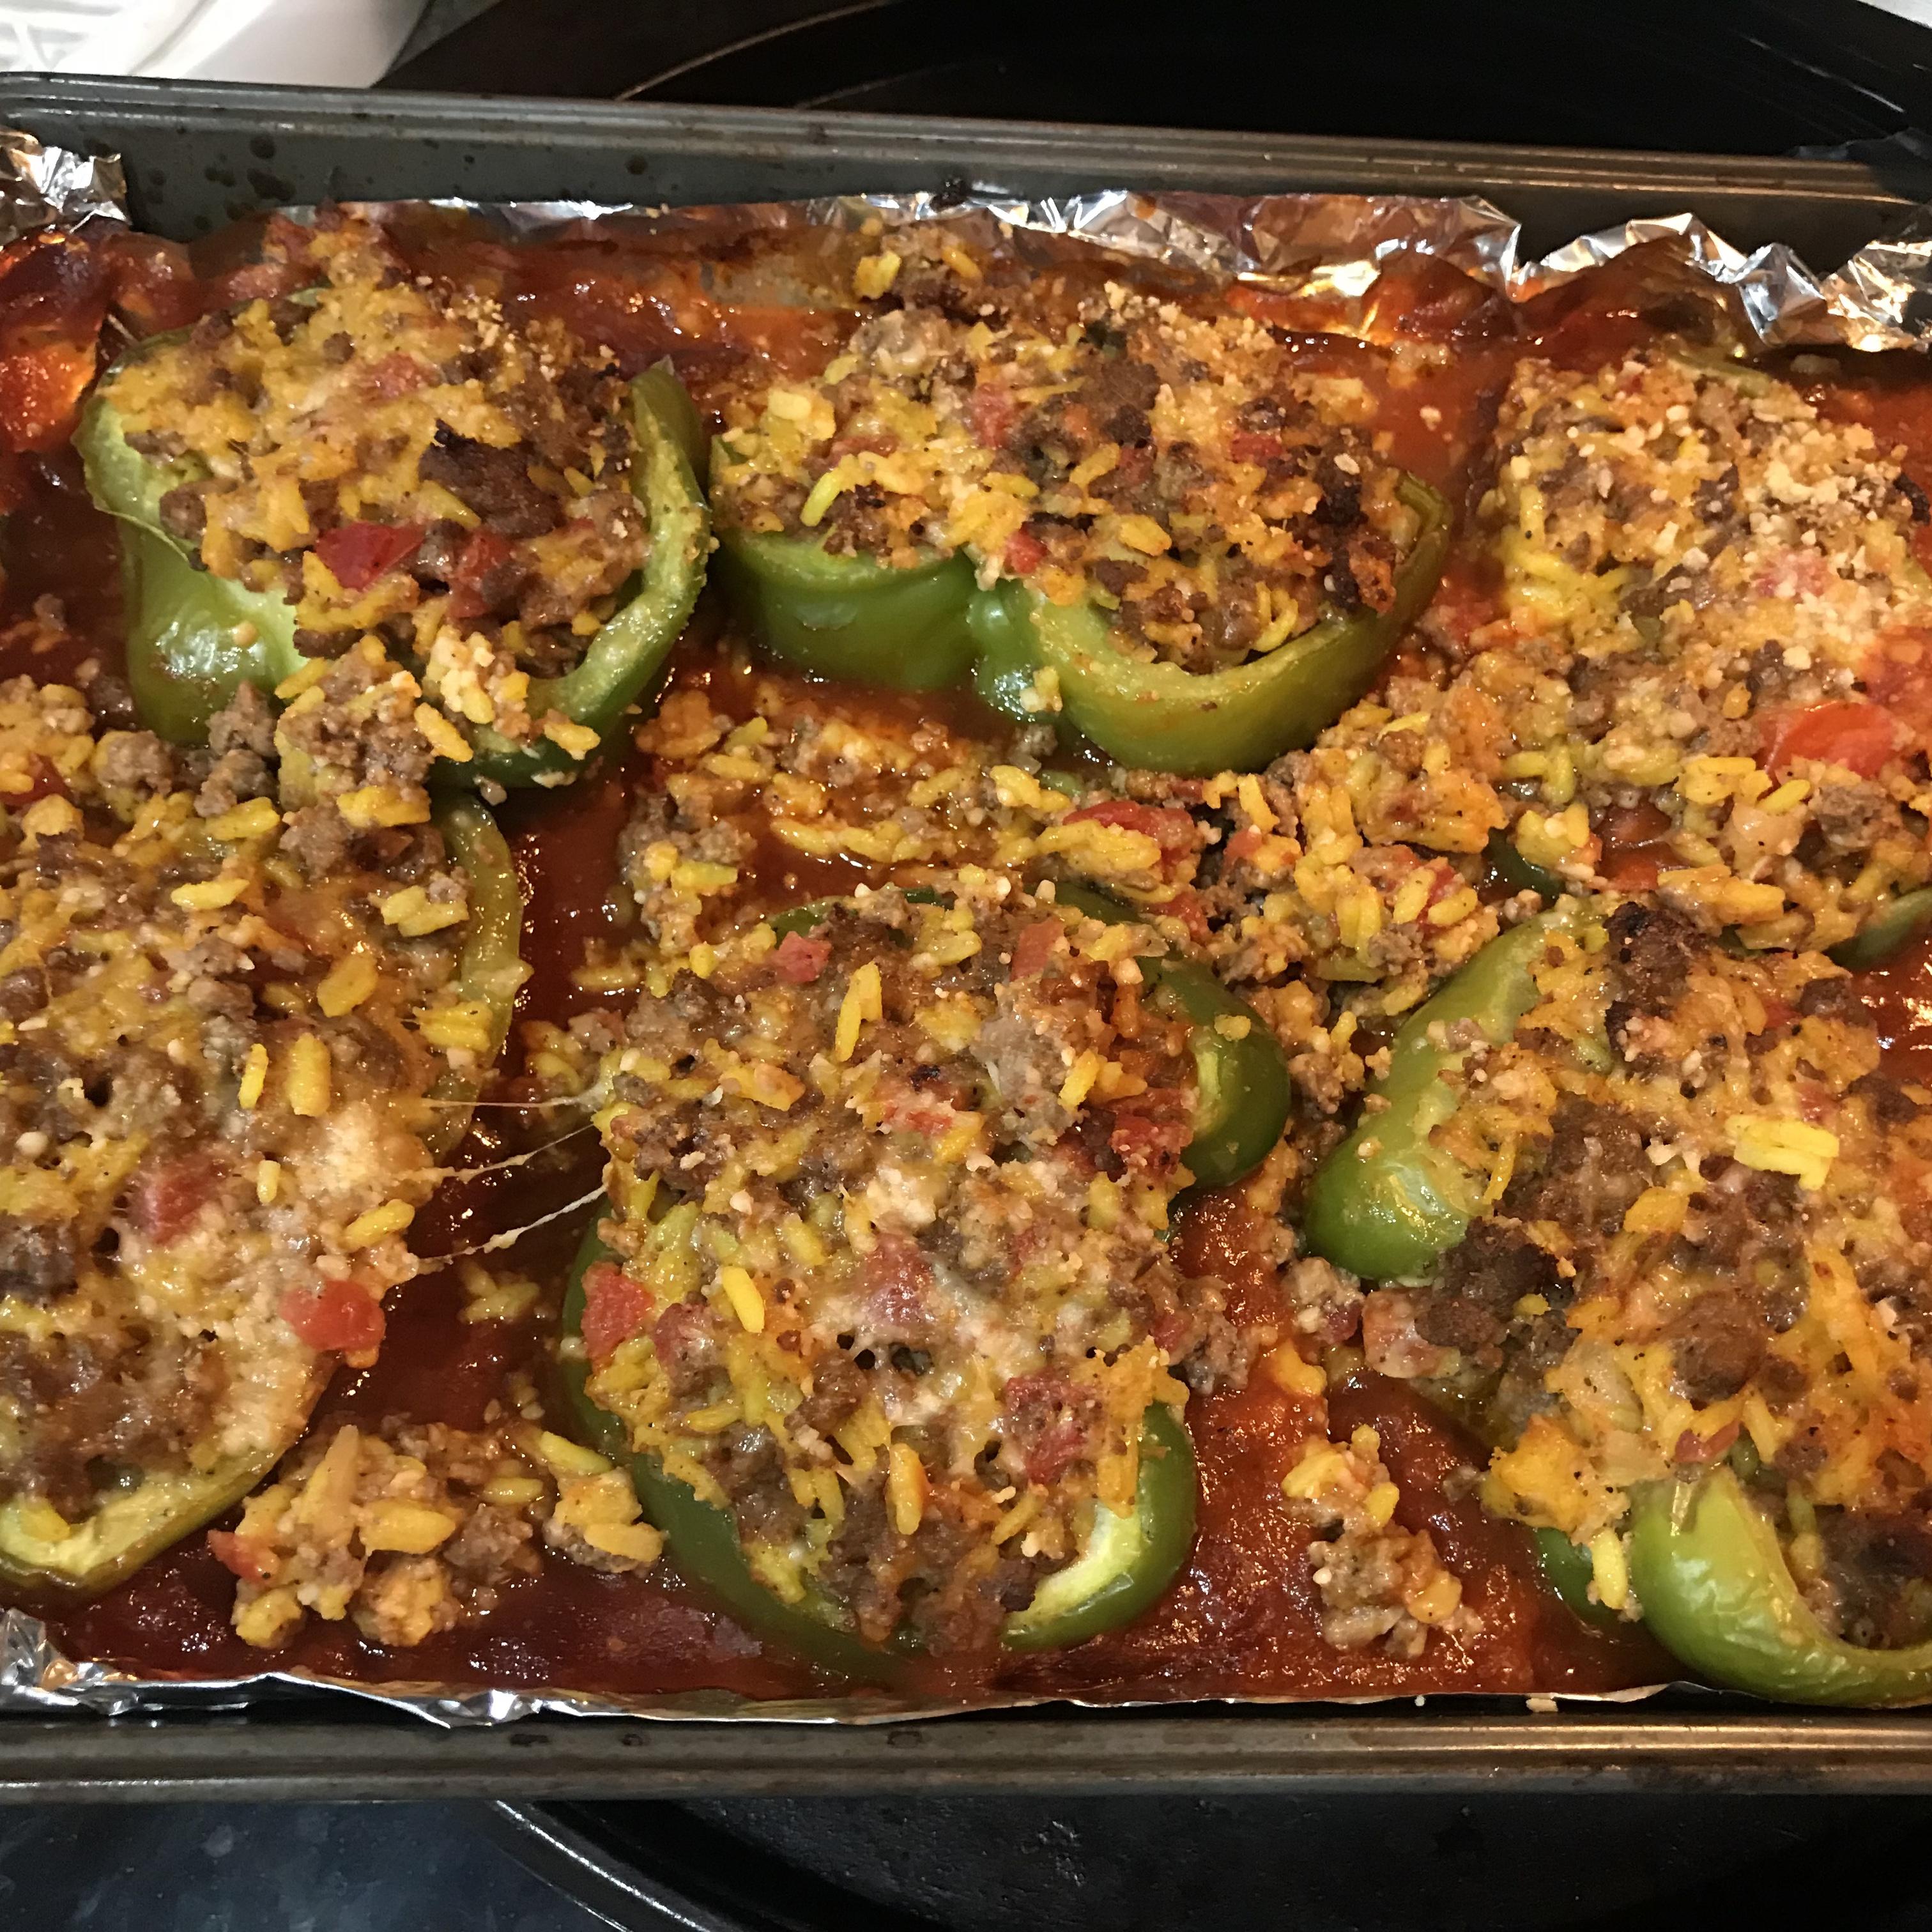 Chef John's Stuffed Peppers